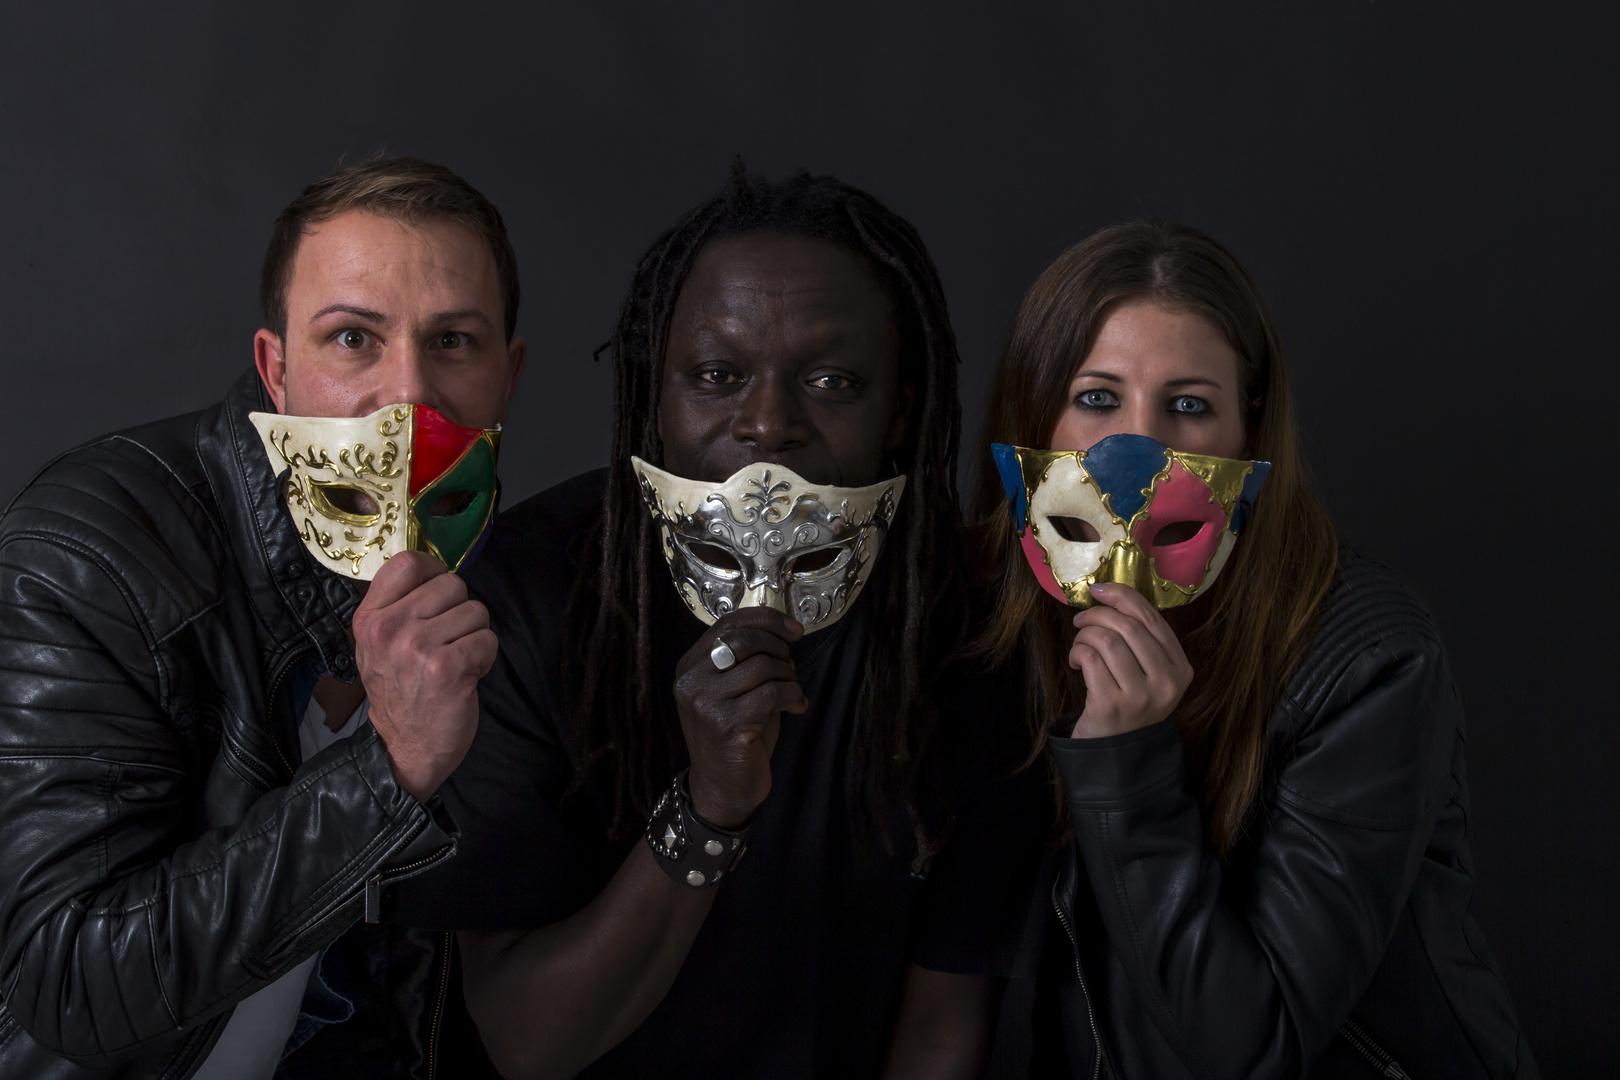 Hasselblad-Preis 2015 in München